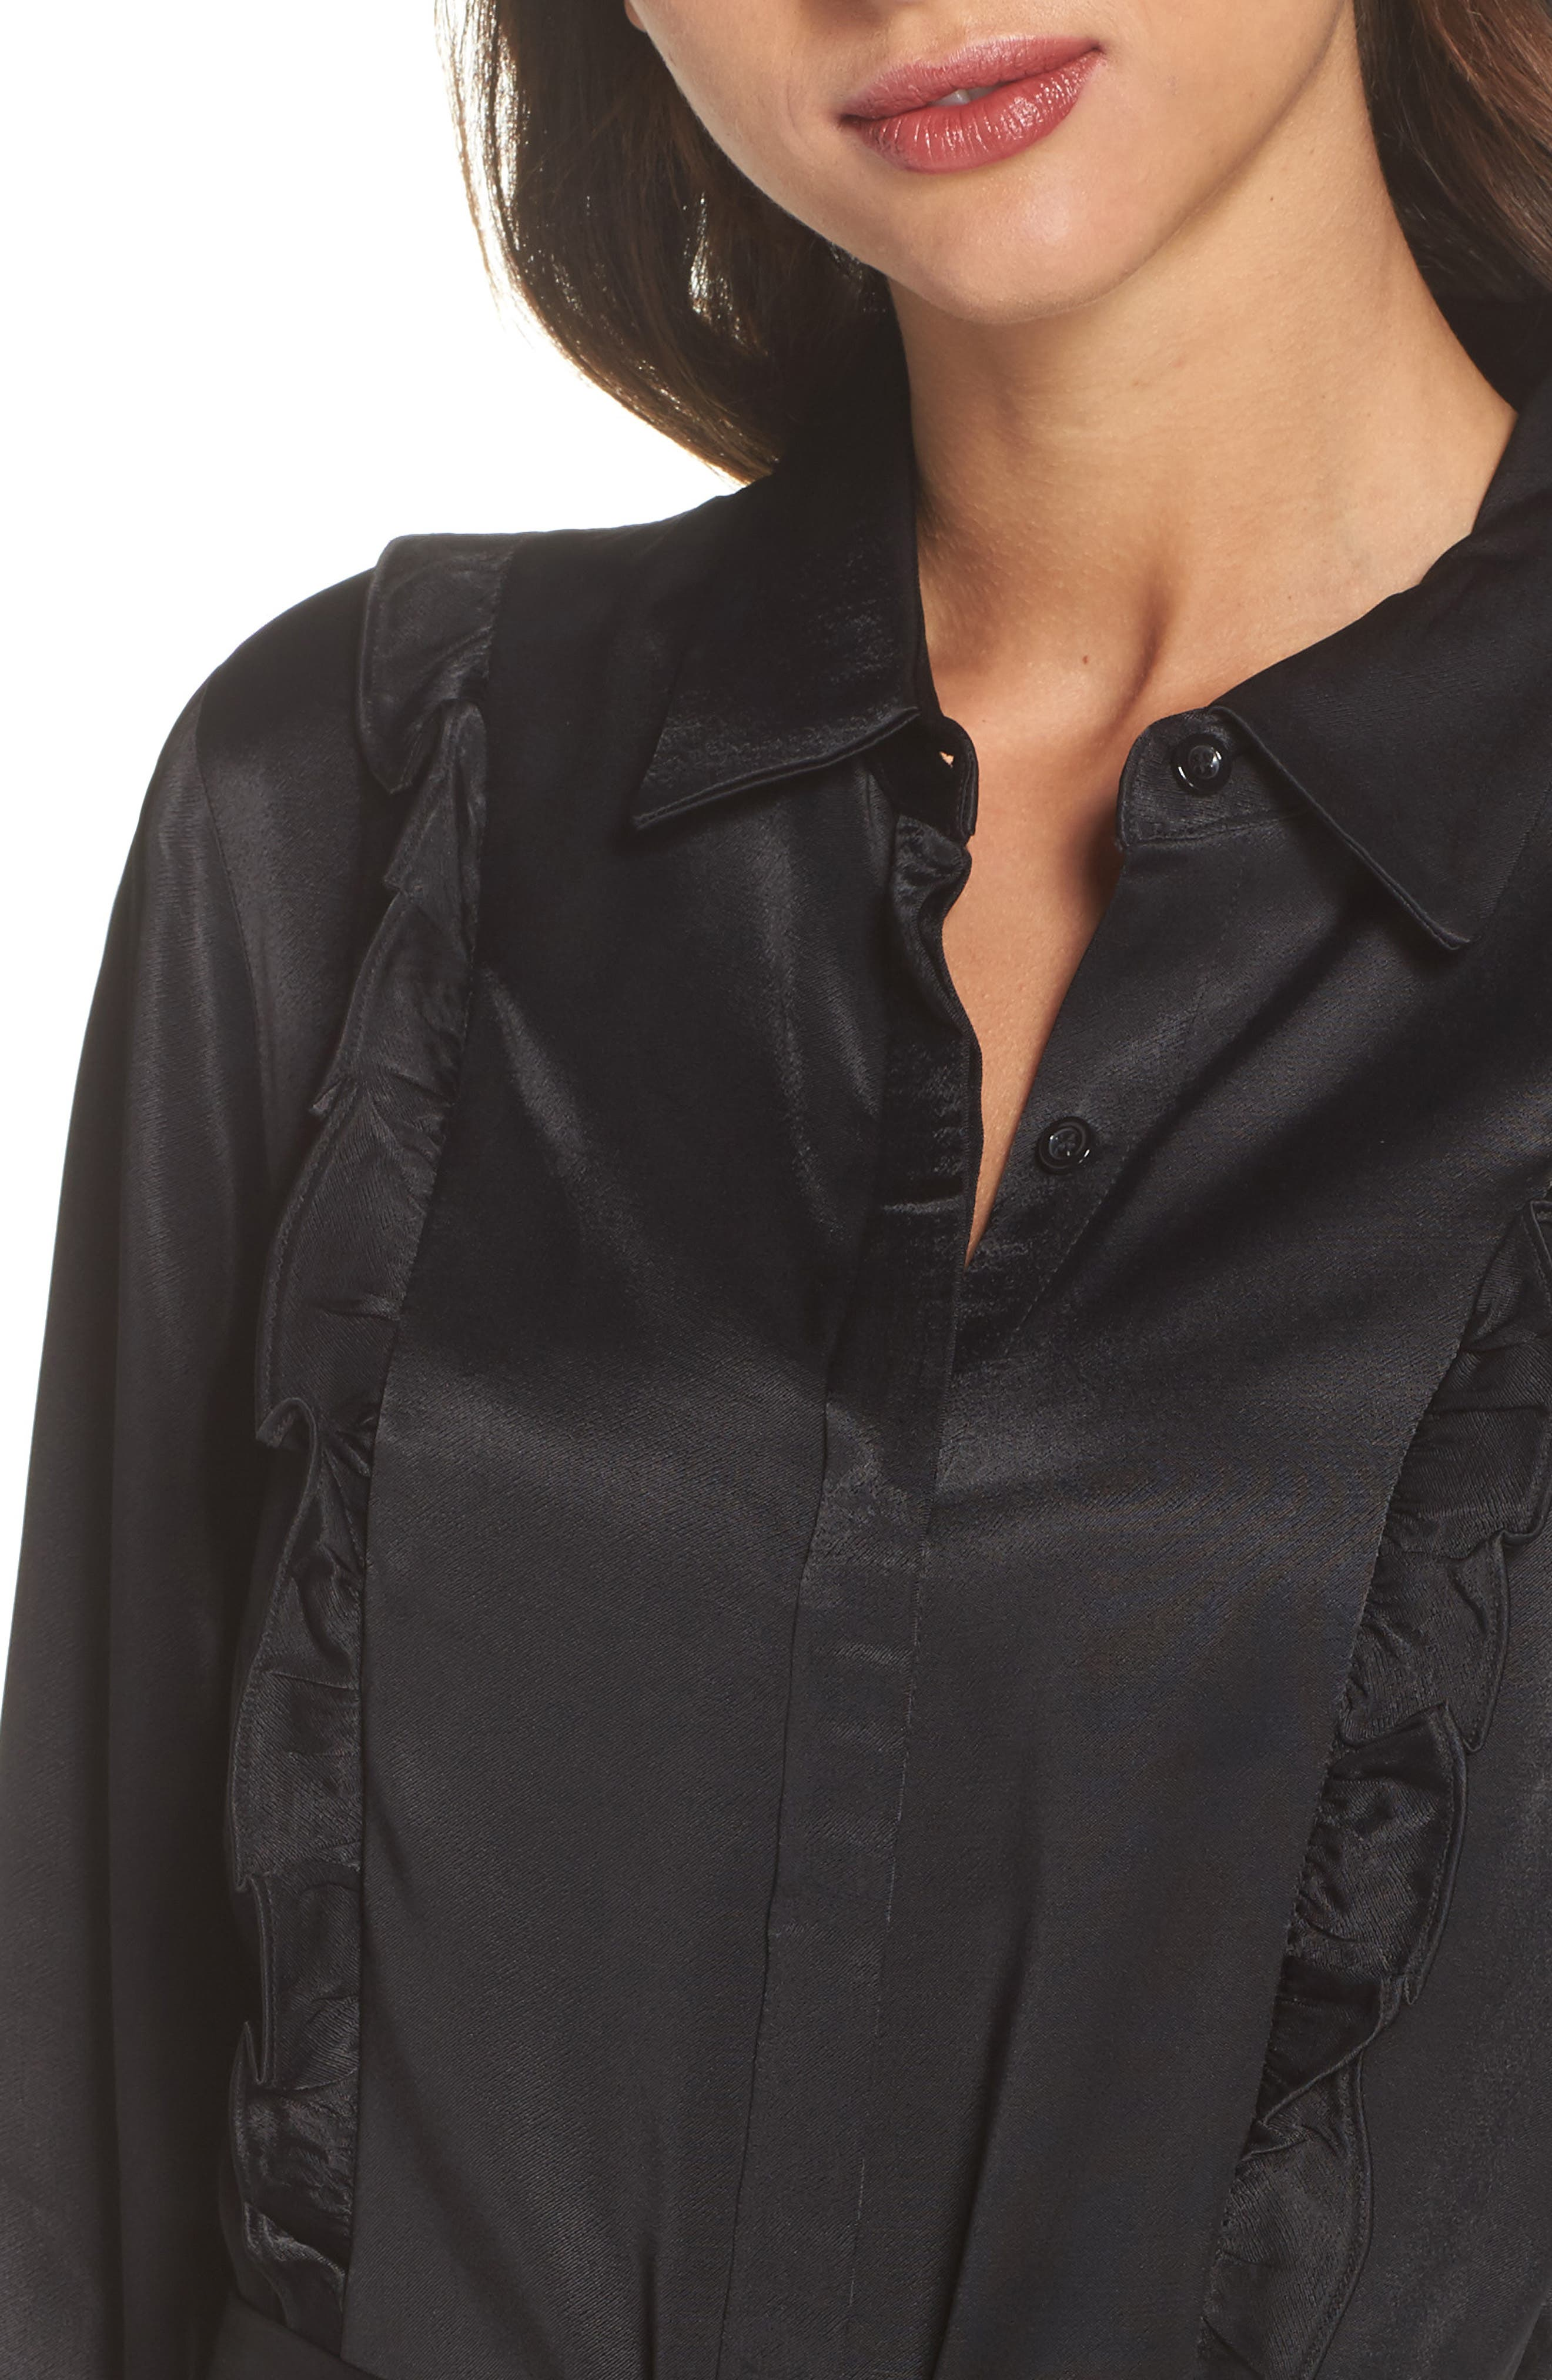 Cassia Ruffle Trim Shirtdress,                             Alternate thumbnail 4, color,                             001